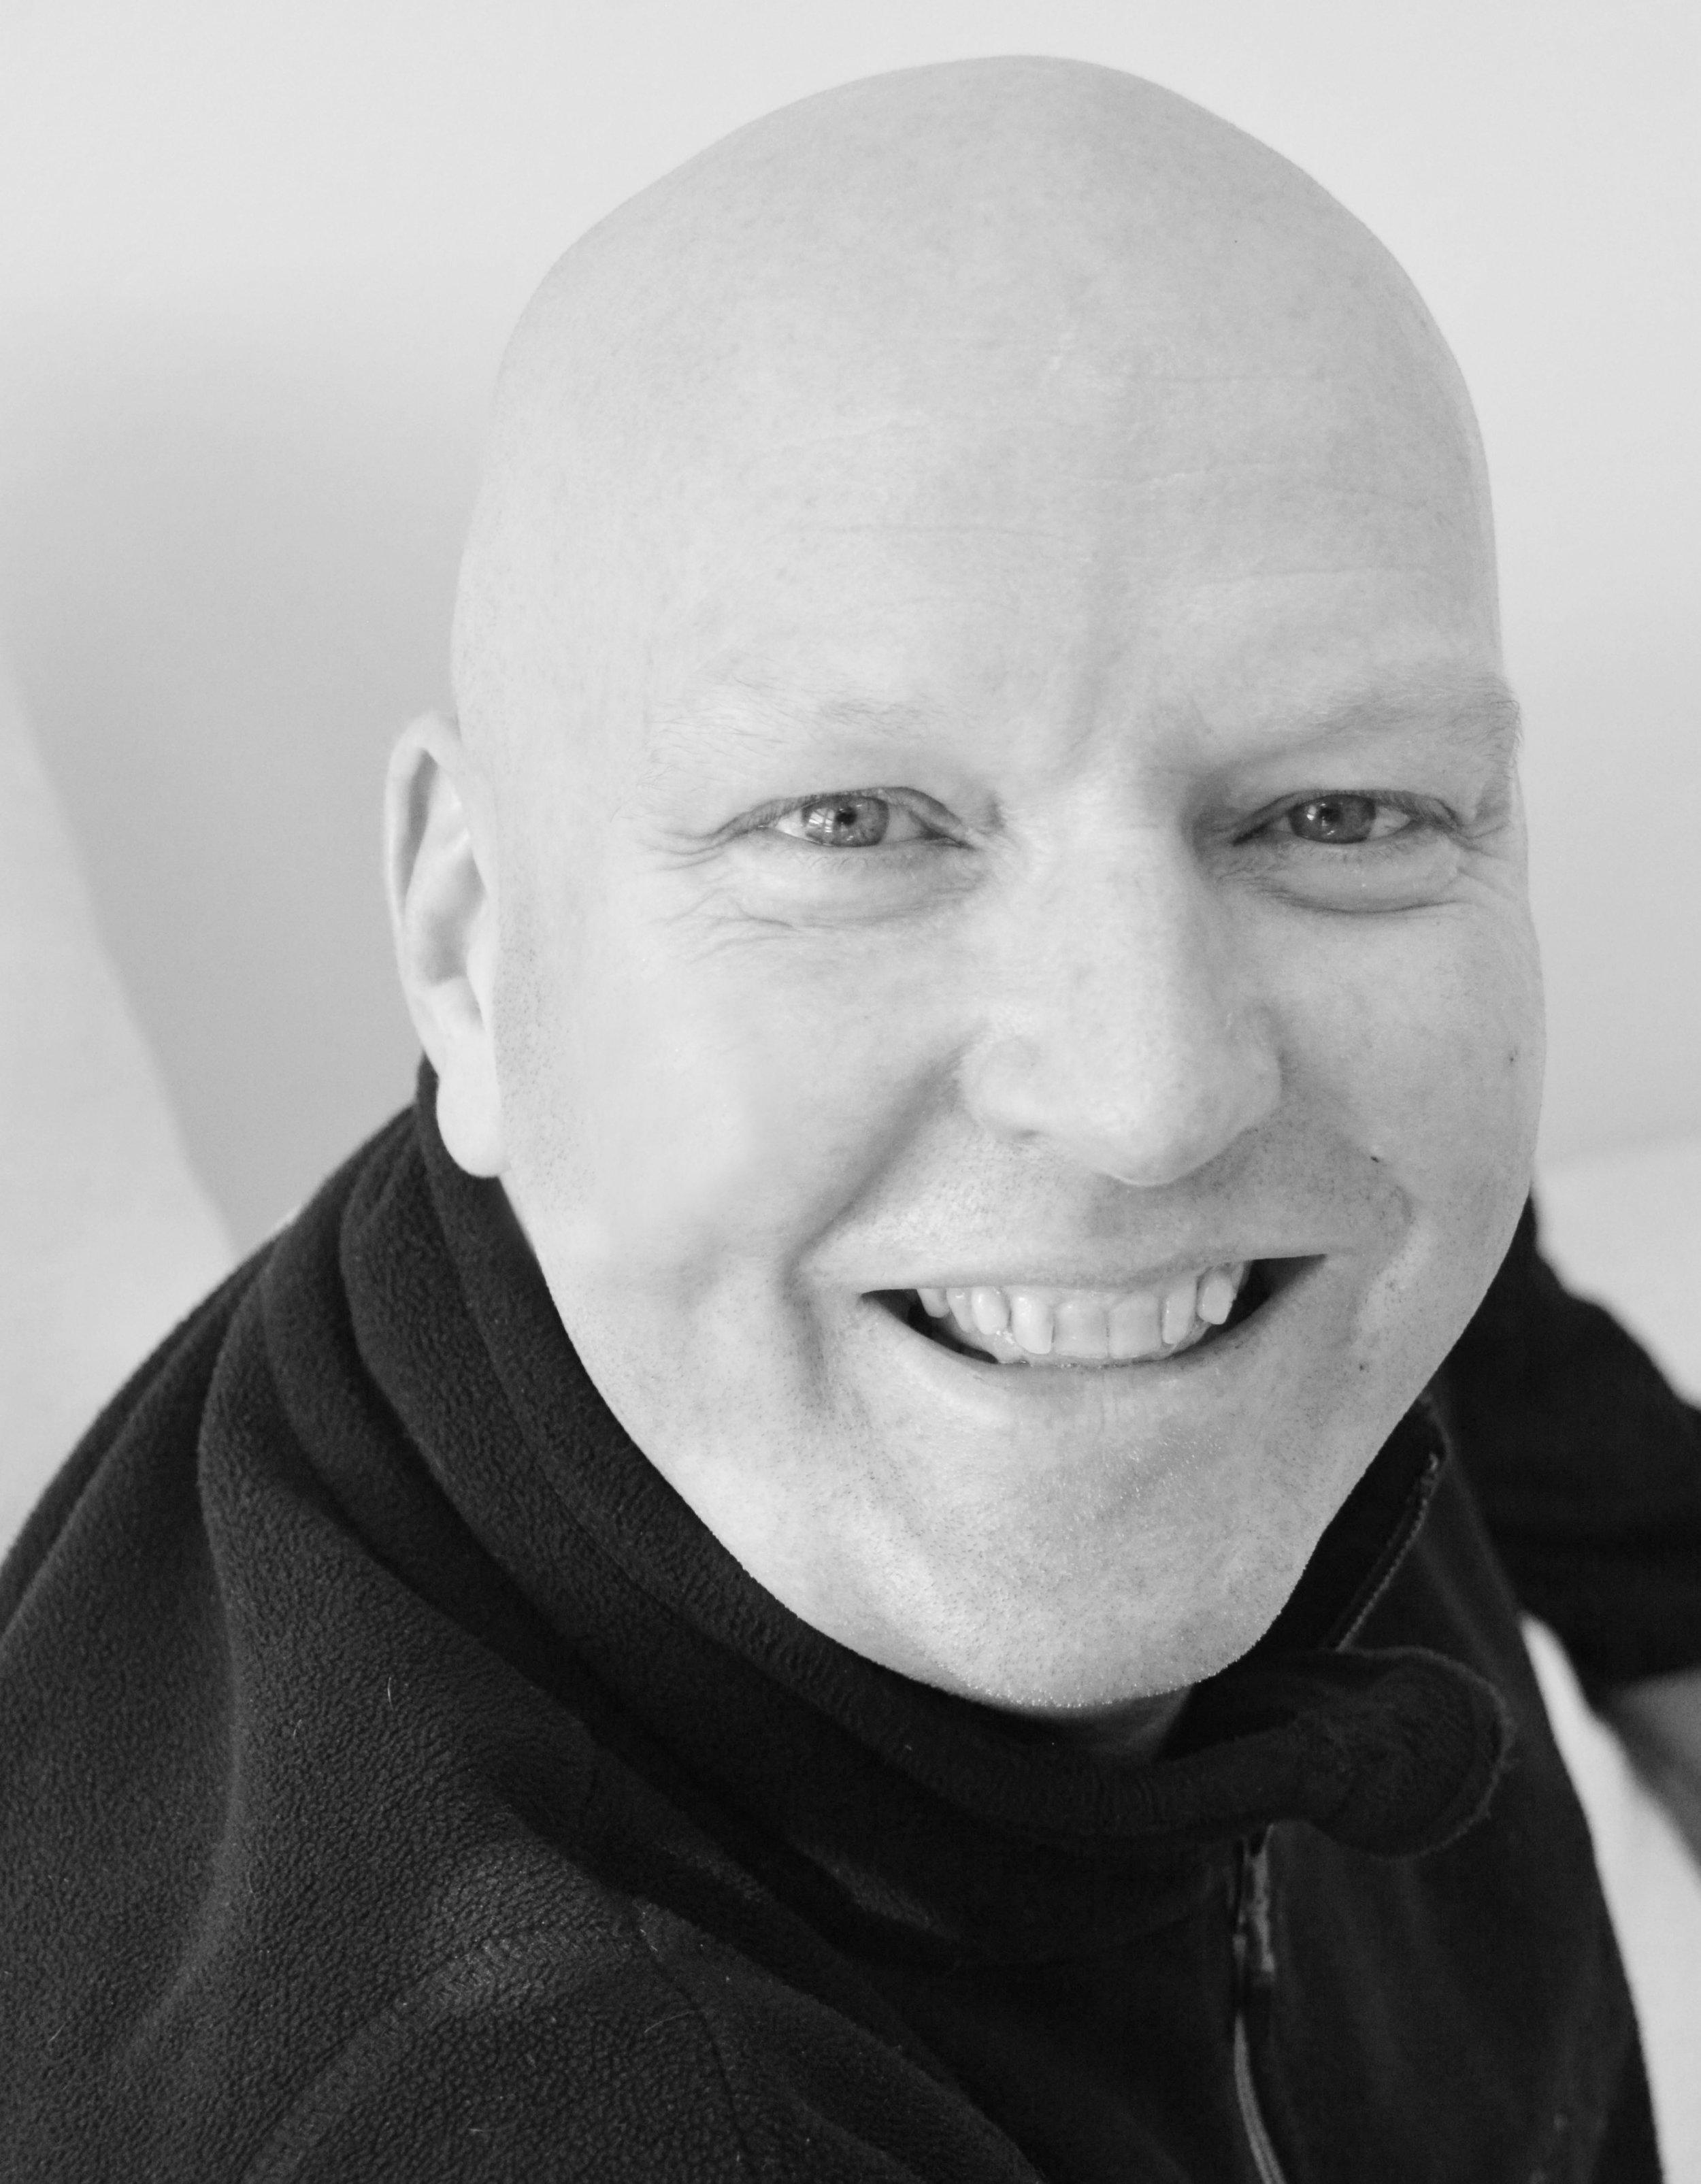 Eric Molenaar (Stv. Verkaufsleiter)